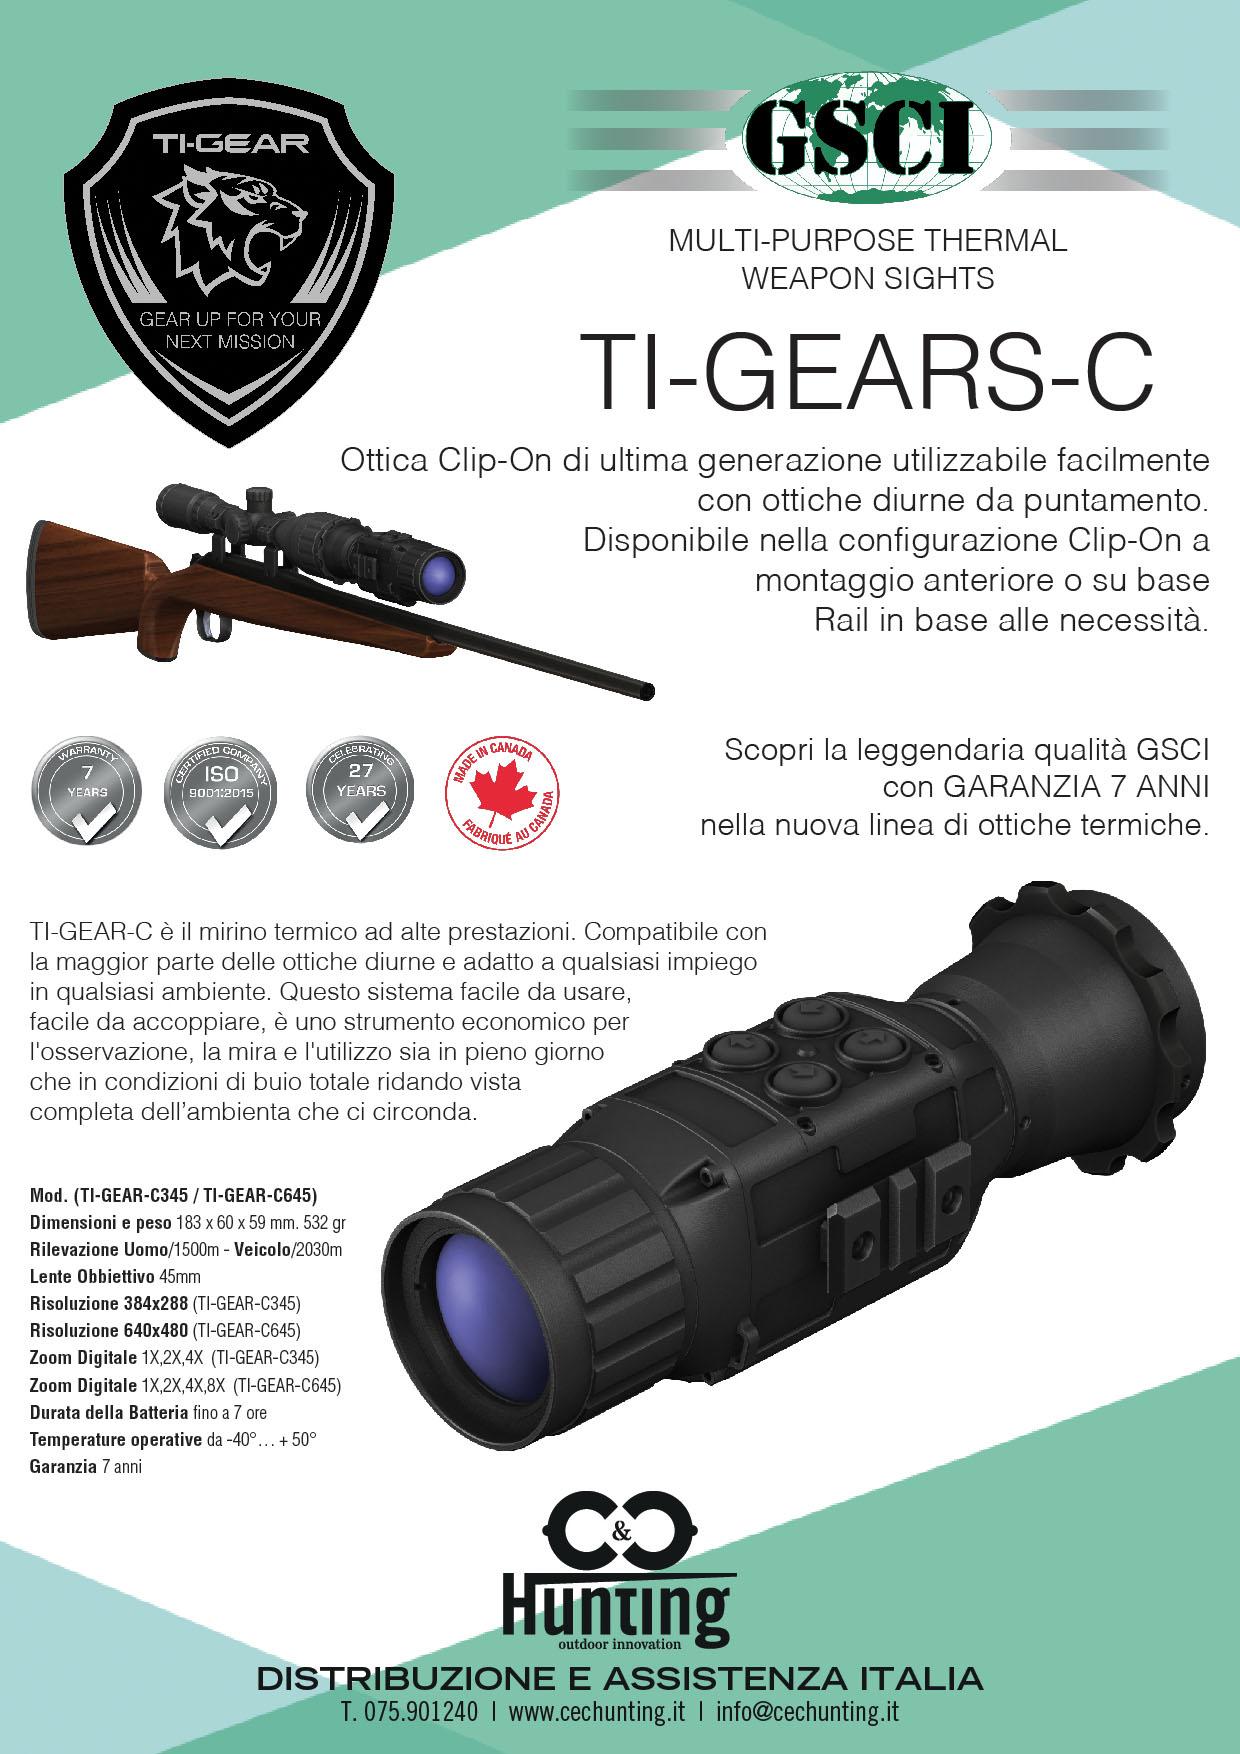 Volantino GSCI Ti-Gears-C